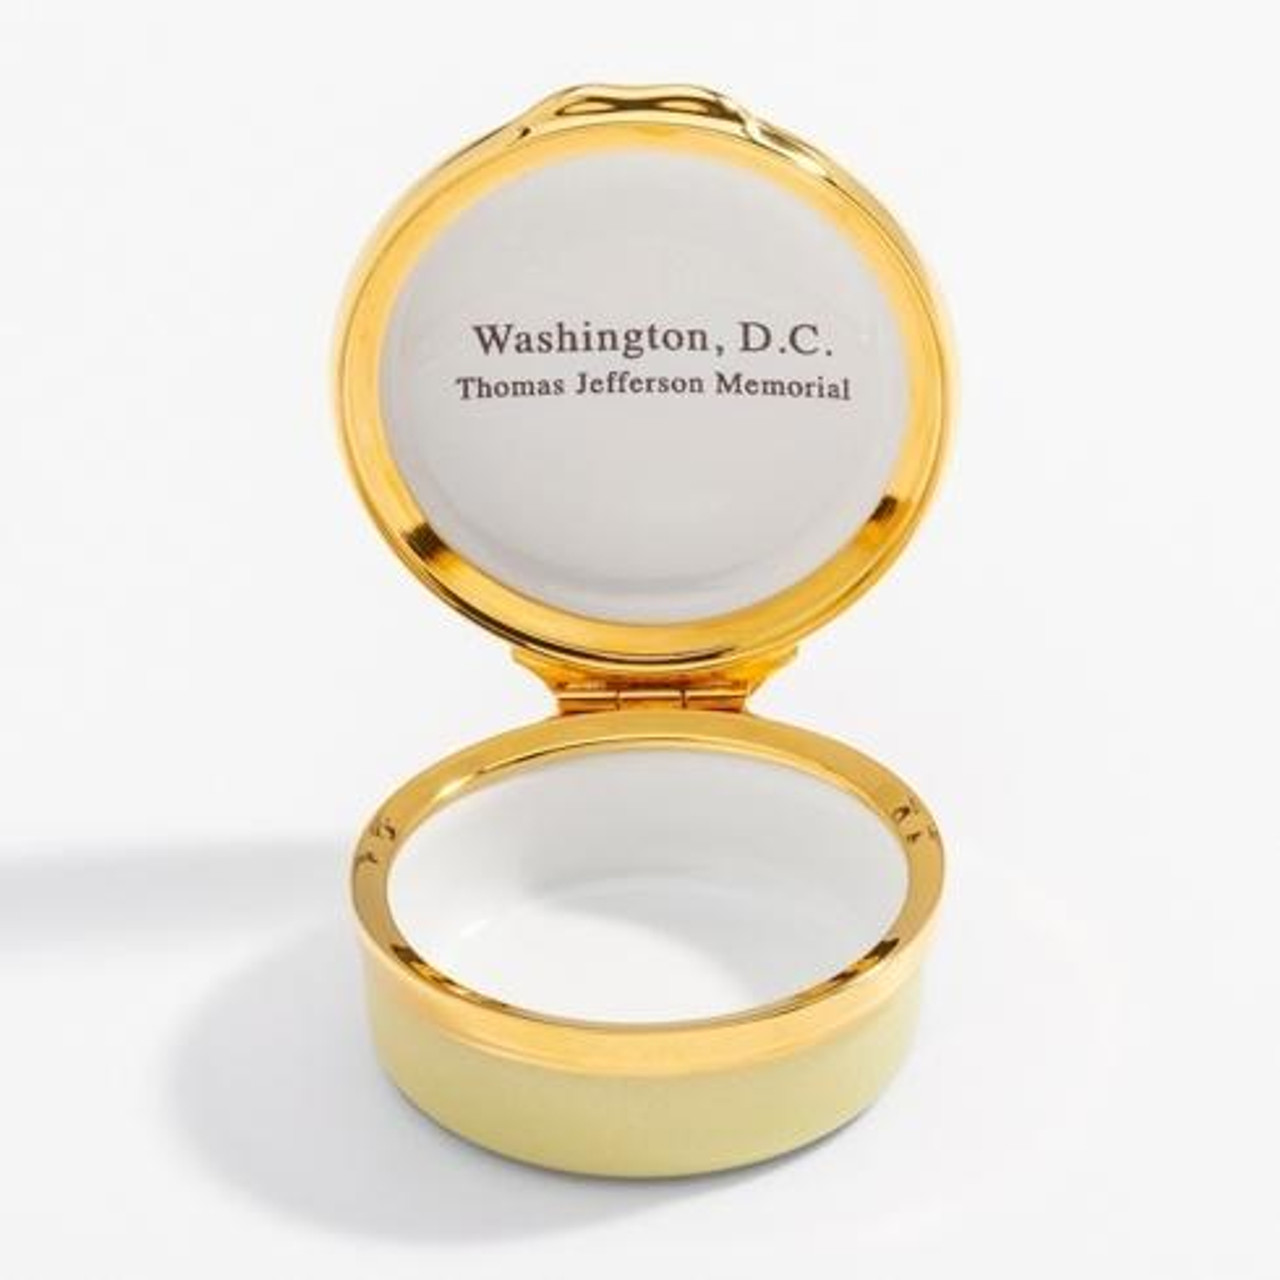 Halcyon Days Washington D.C. in Spring ENWDC2601G